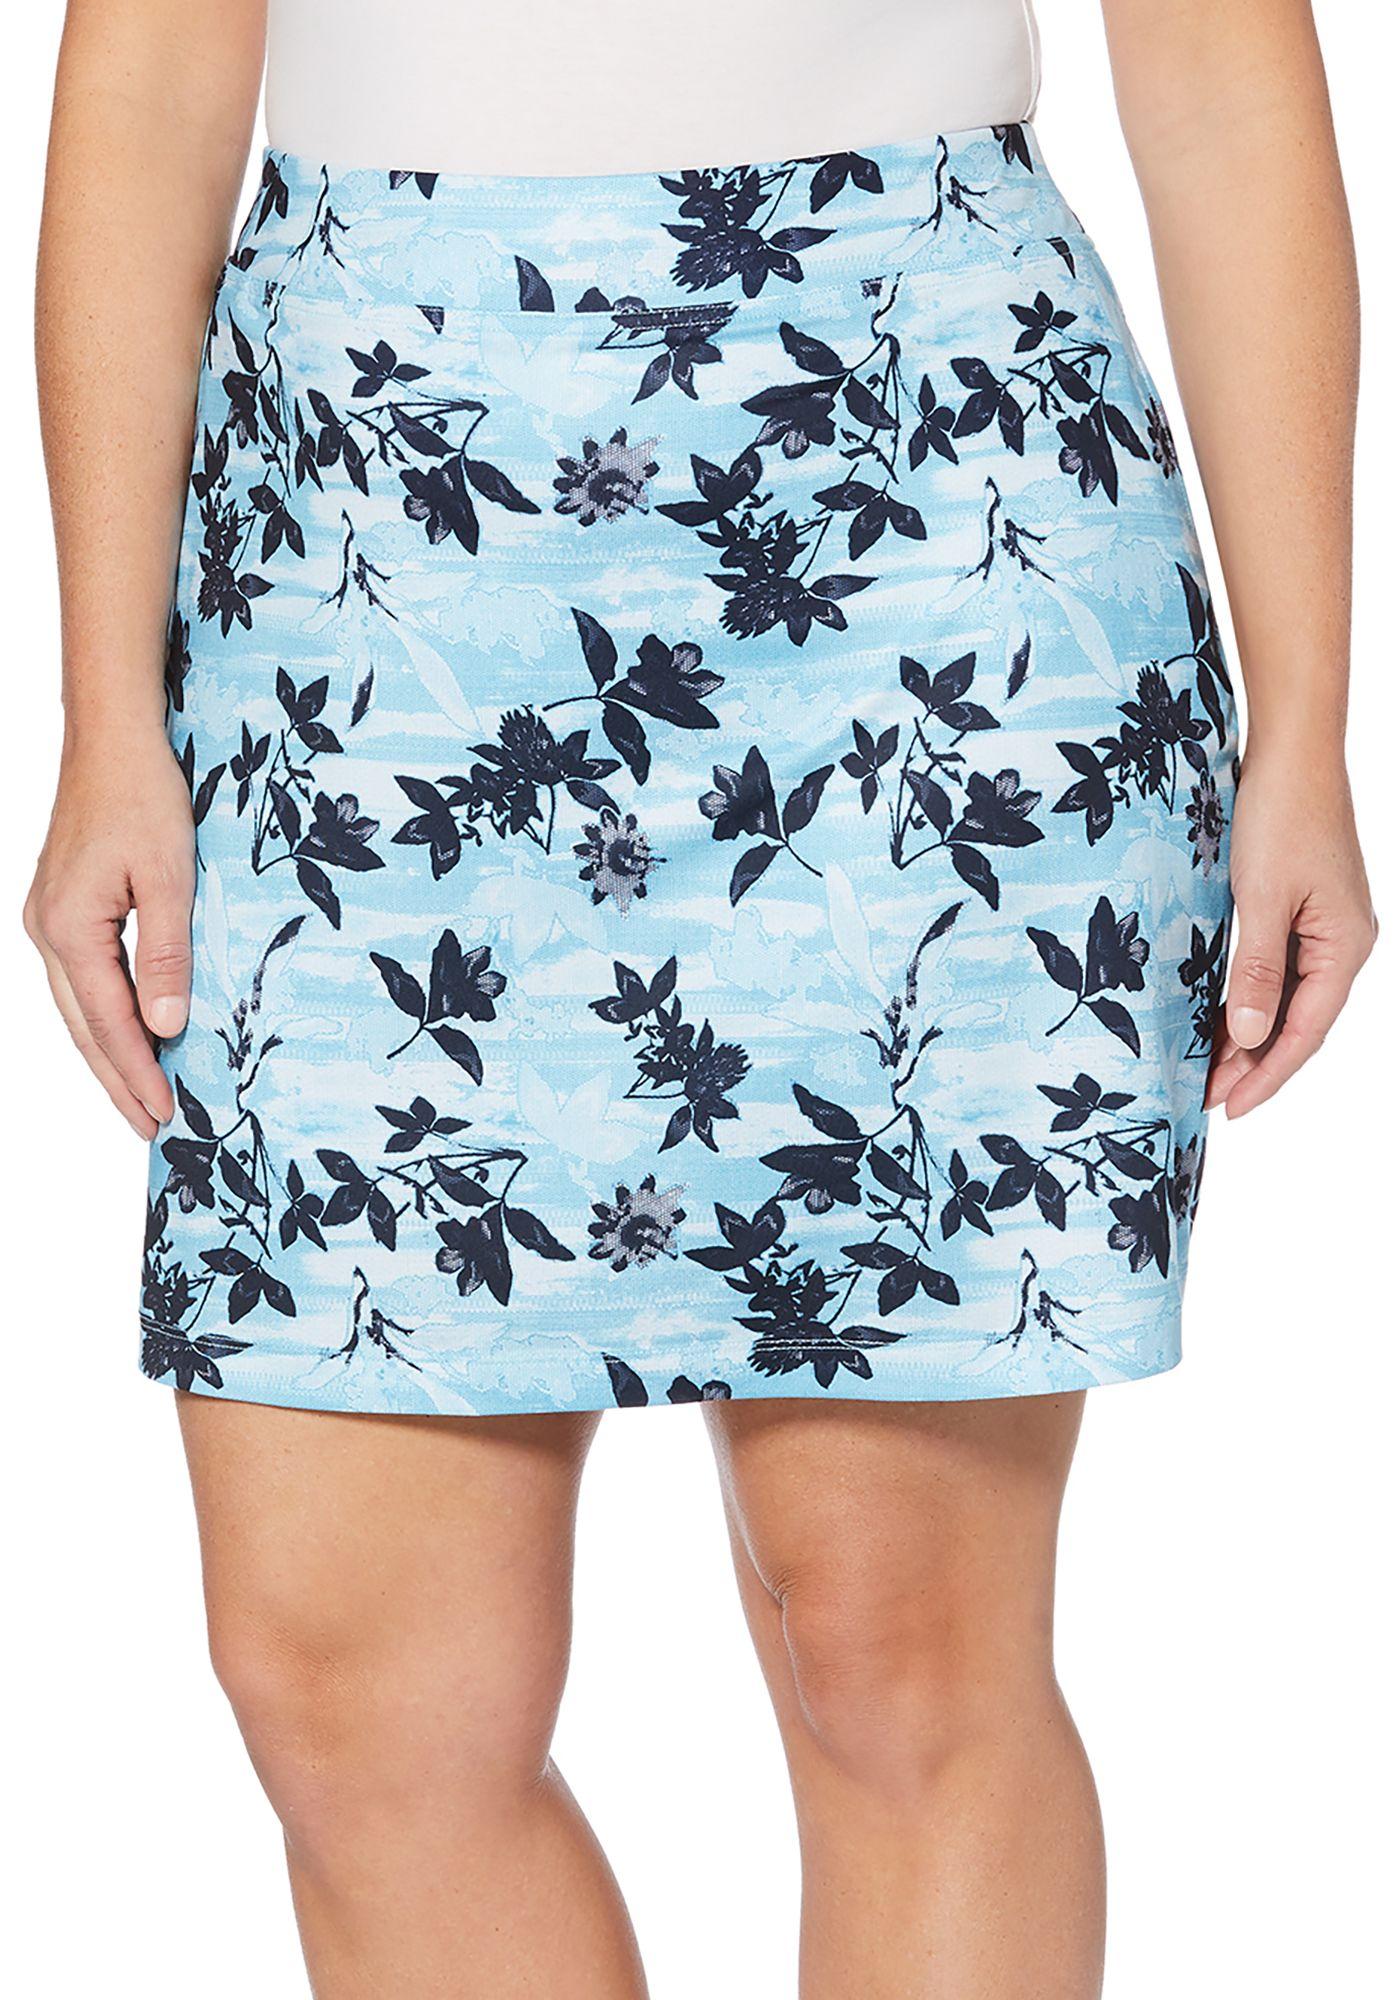 Callaway Women's Floral Print Golf Skort - Extended Sizes